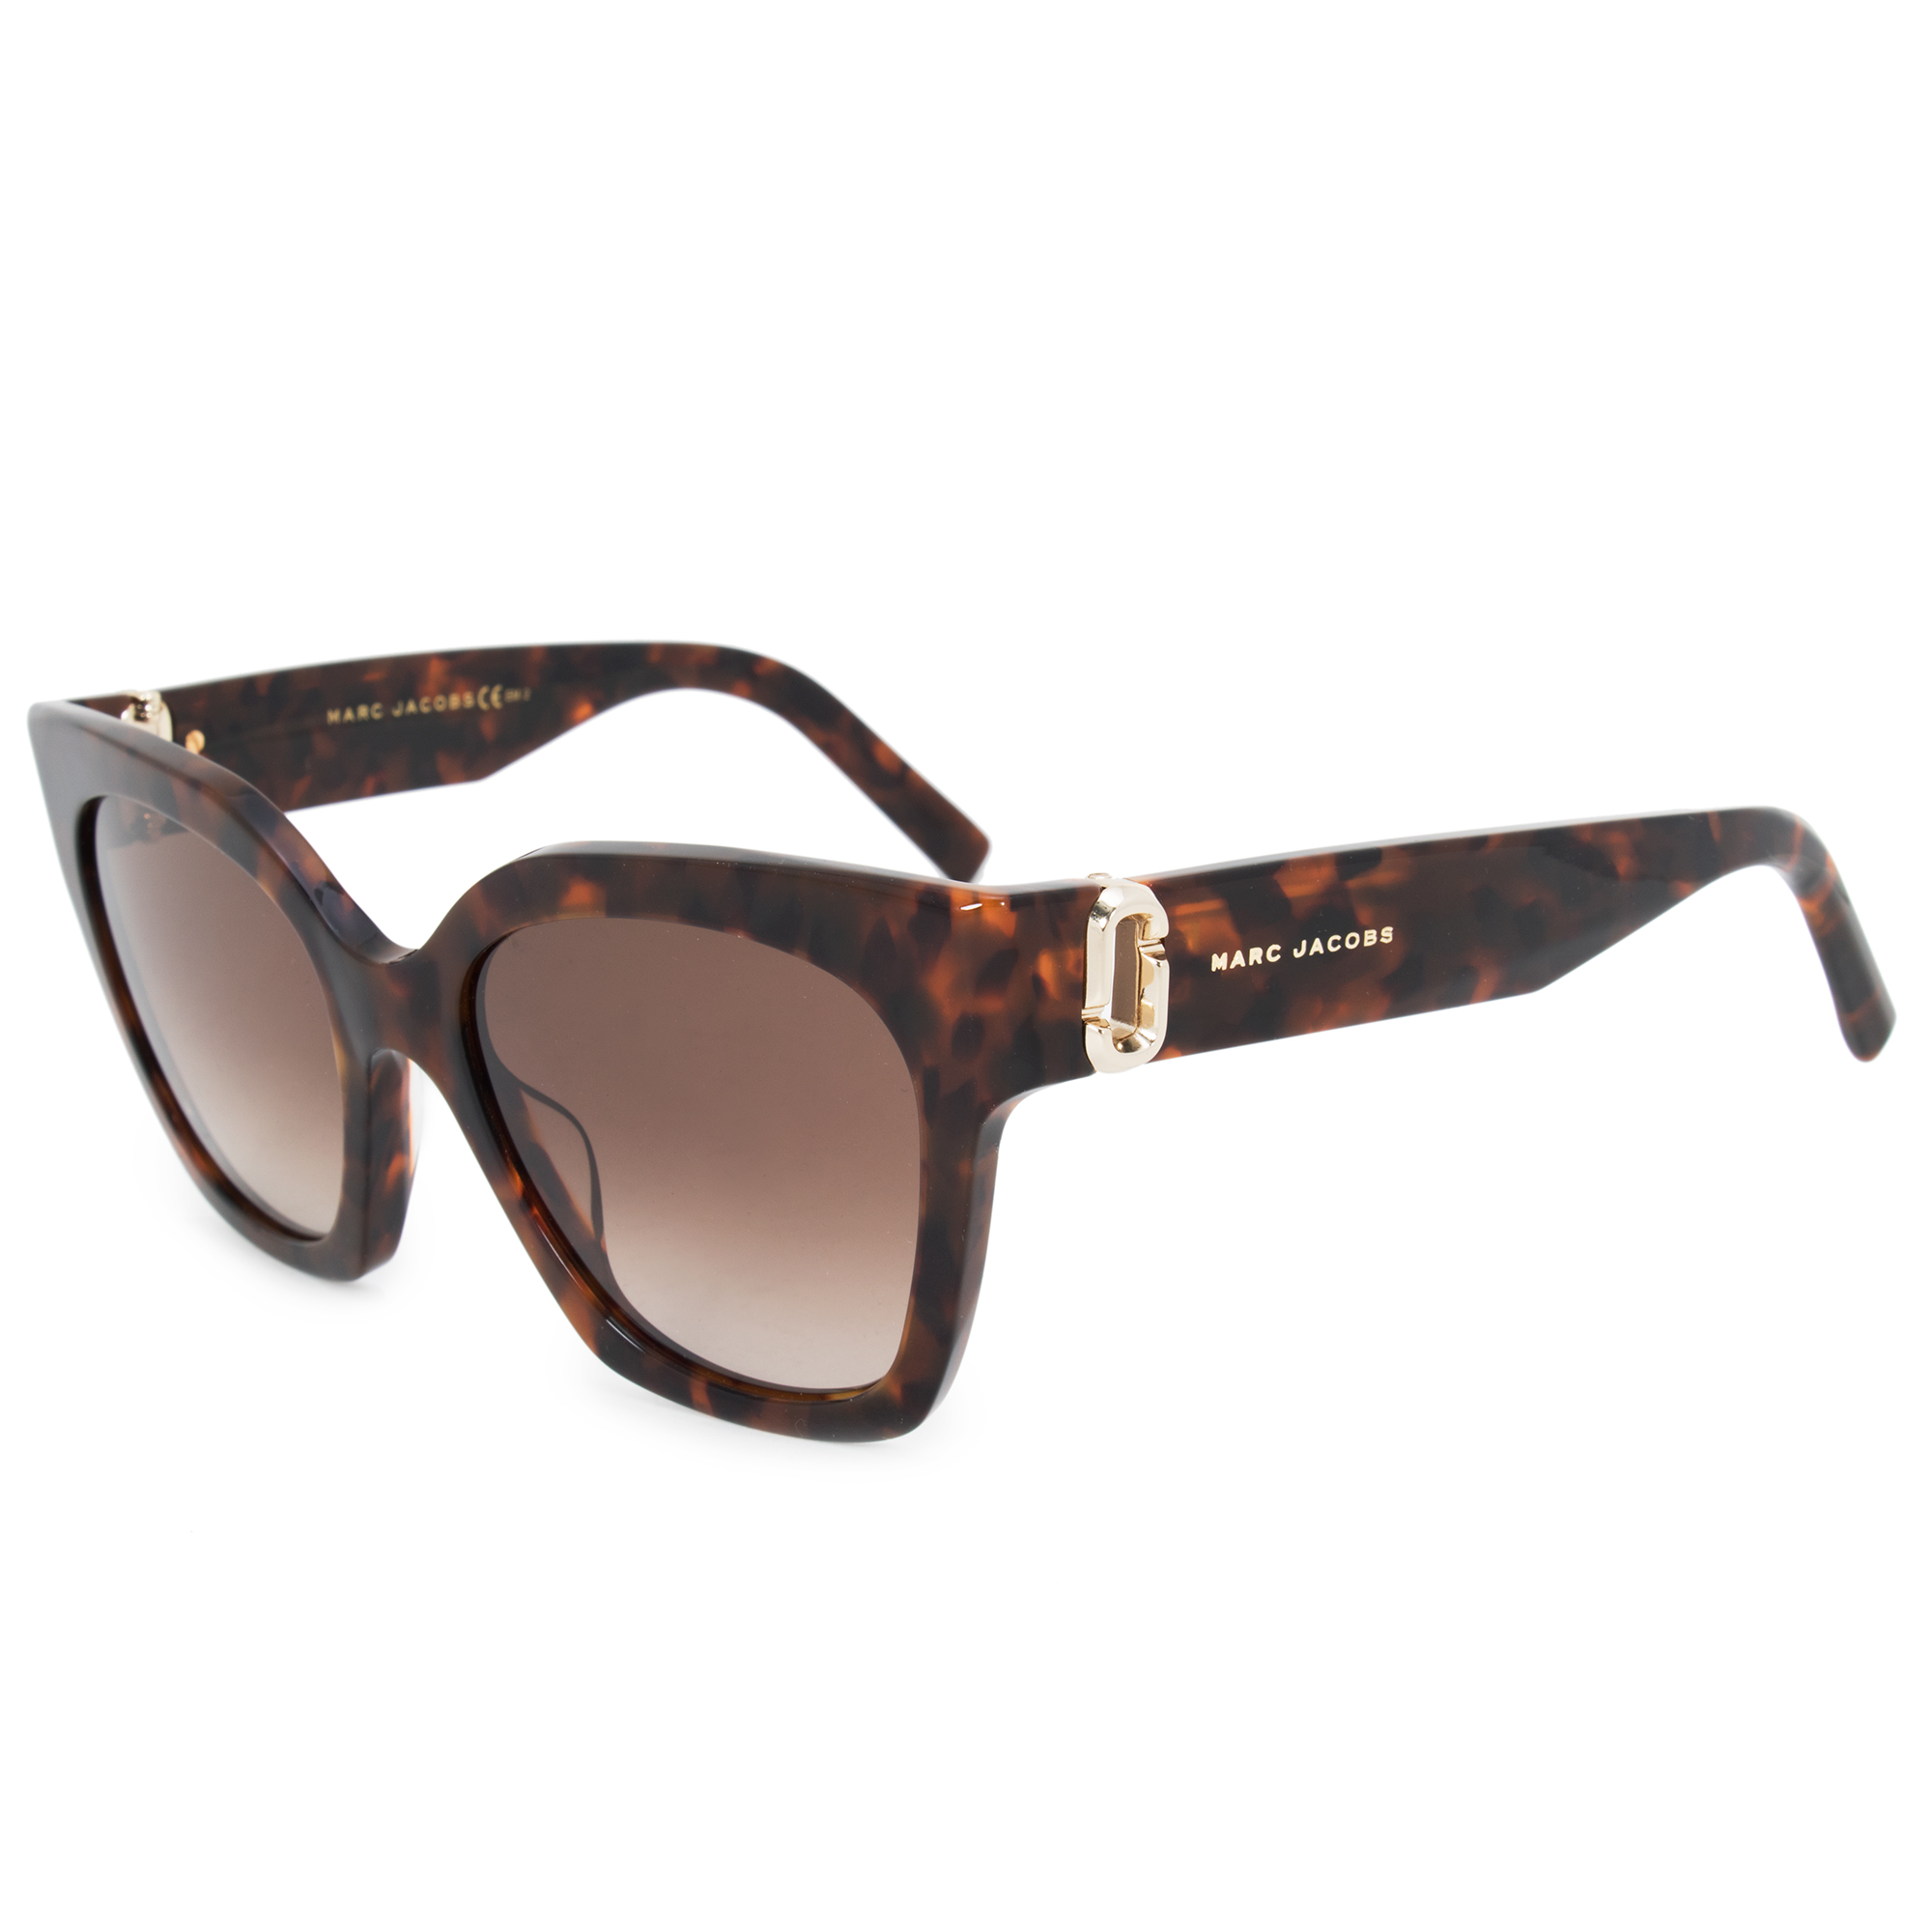 fee19667c33 Marc Jacobs Marc Jacobs Cat Eye Sunglasses MJ182S 086 HA 52 ...